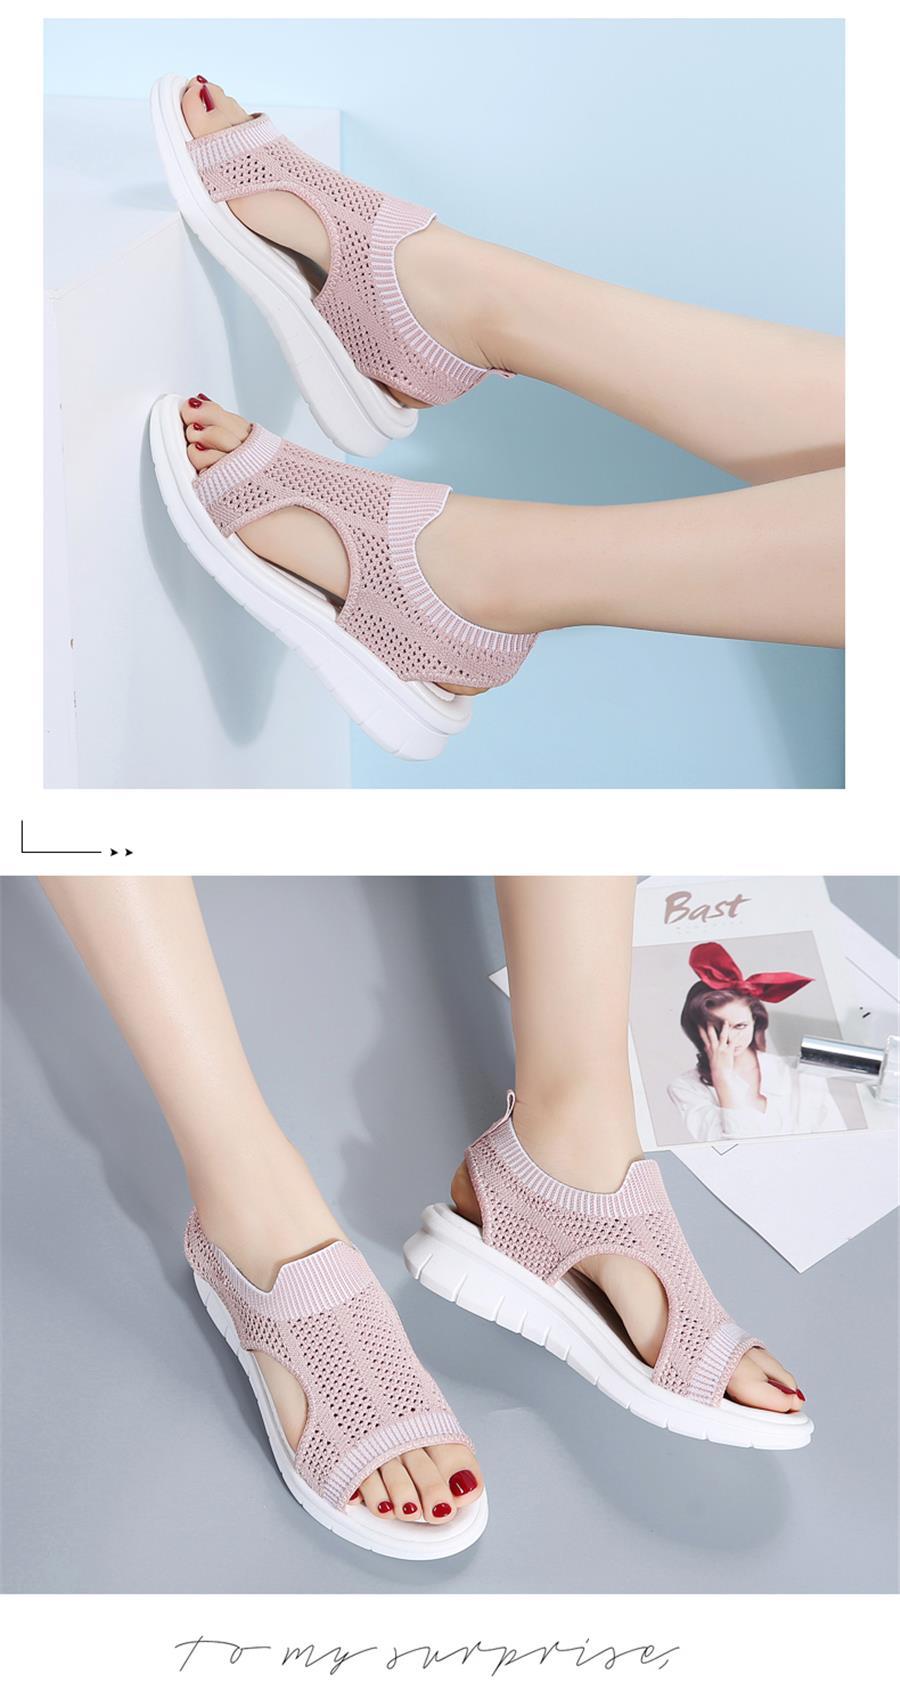 HTB13lljRXzqK1RjSZFvq6AB7VXaW STQ Women sandals 2019 female shoes women summer wedge comfort sandals ladies flat slingback flat sandals women sandalias 7739